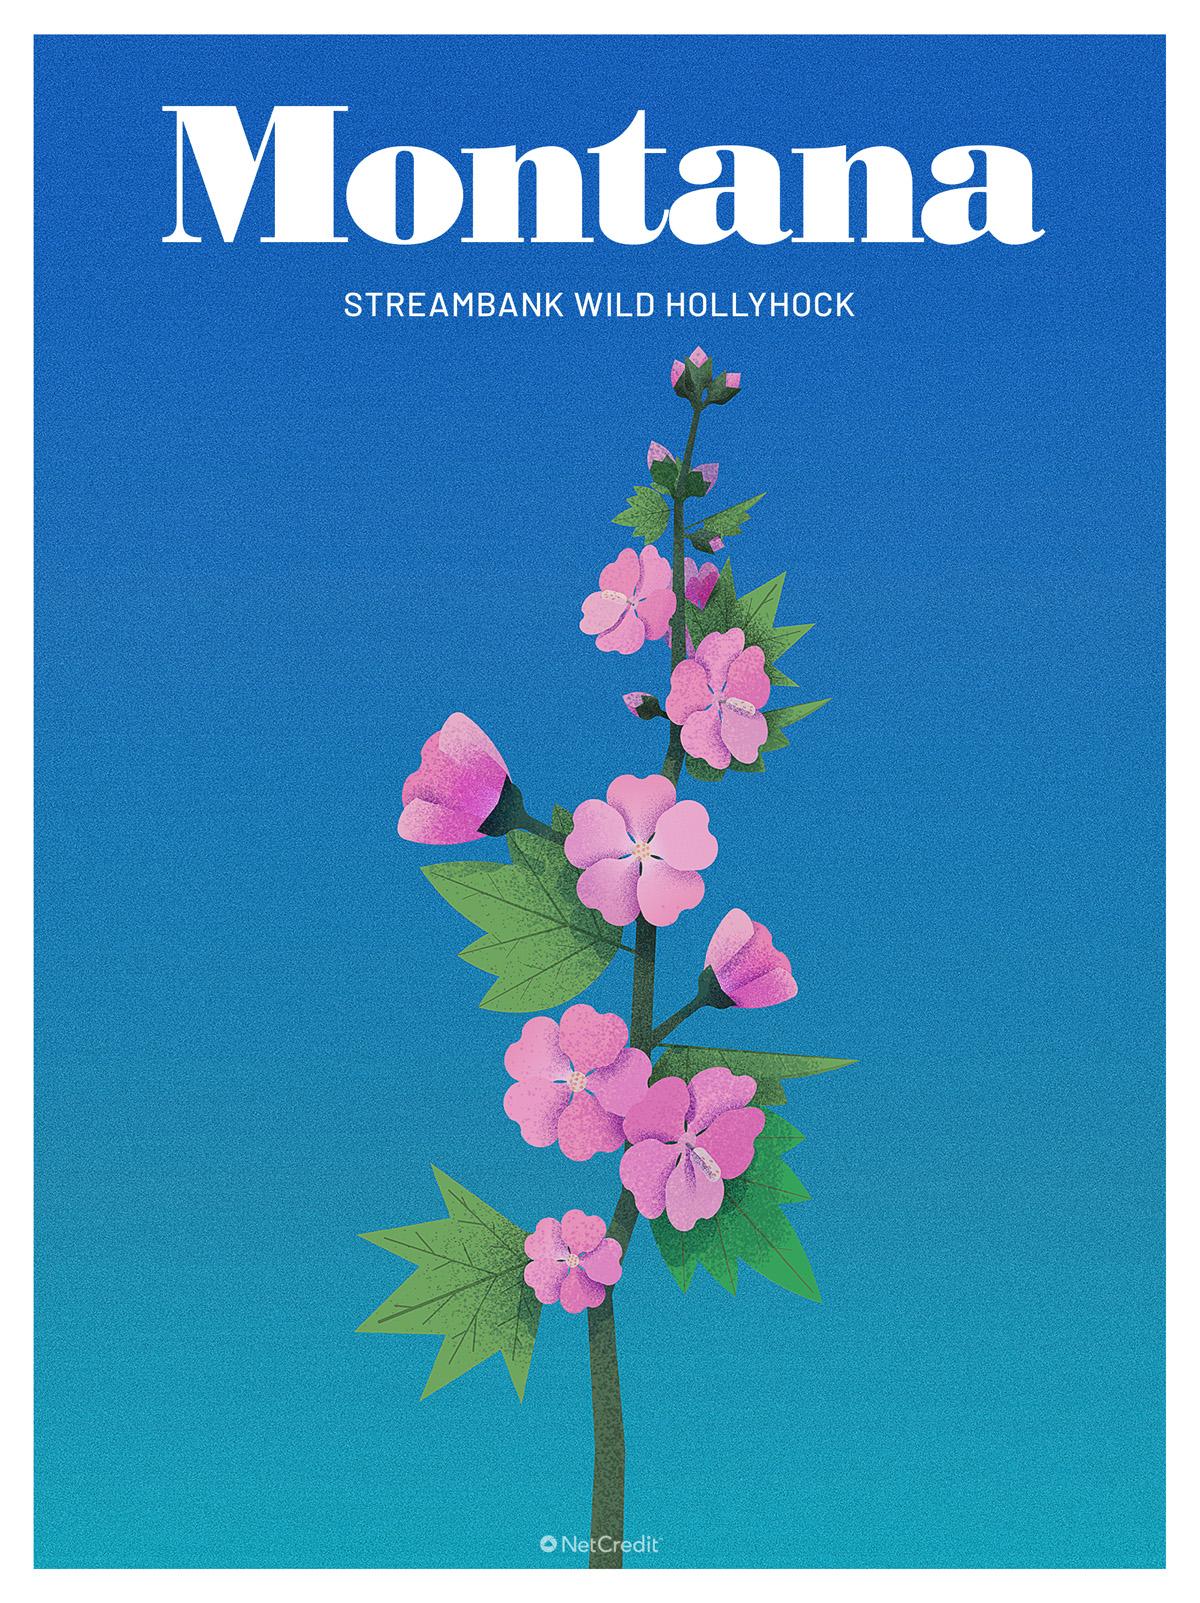 Endangered Plant in Montana: Streambank Wild Hollyhock